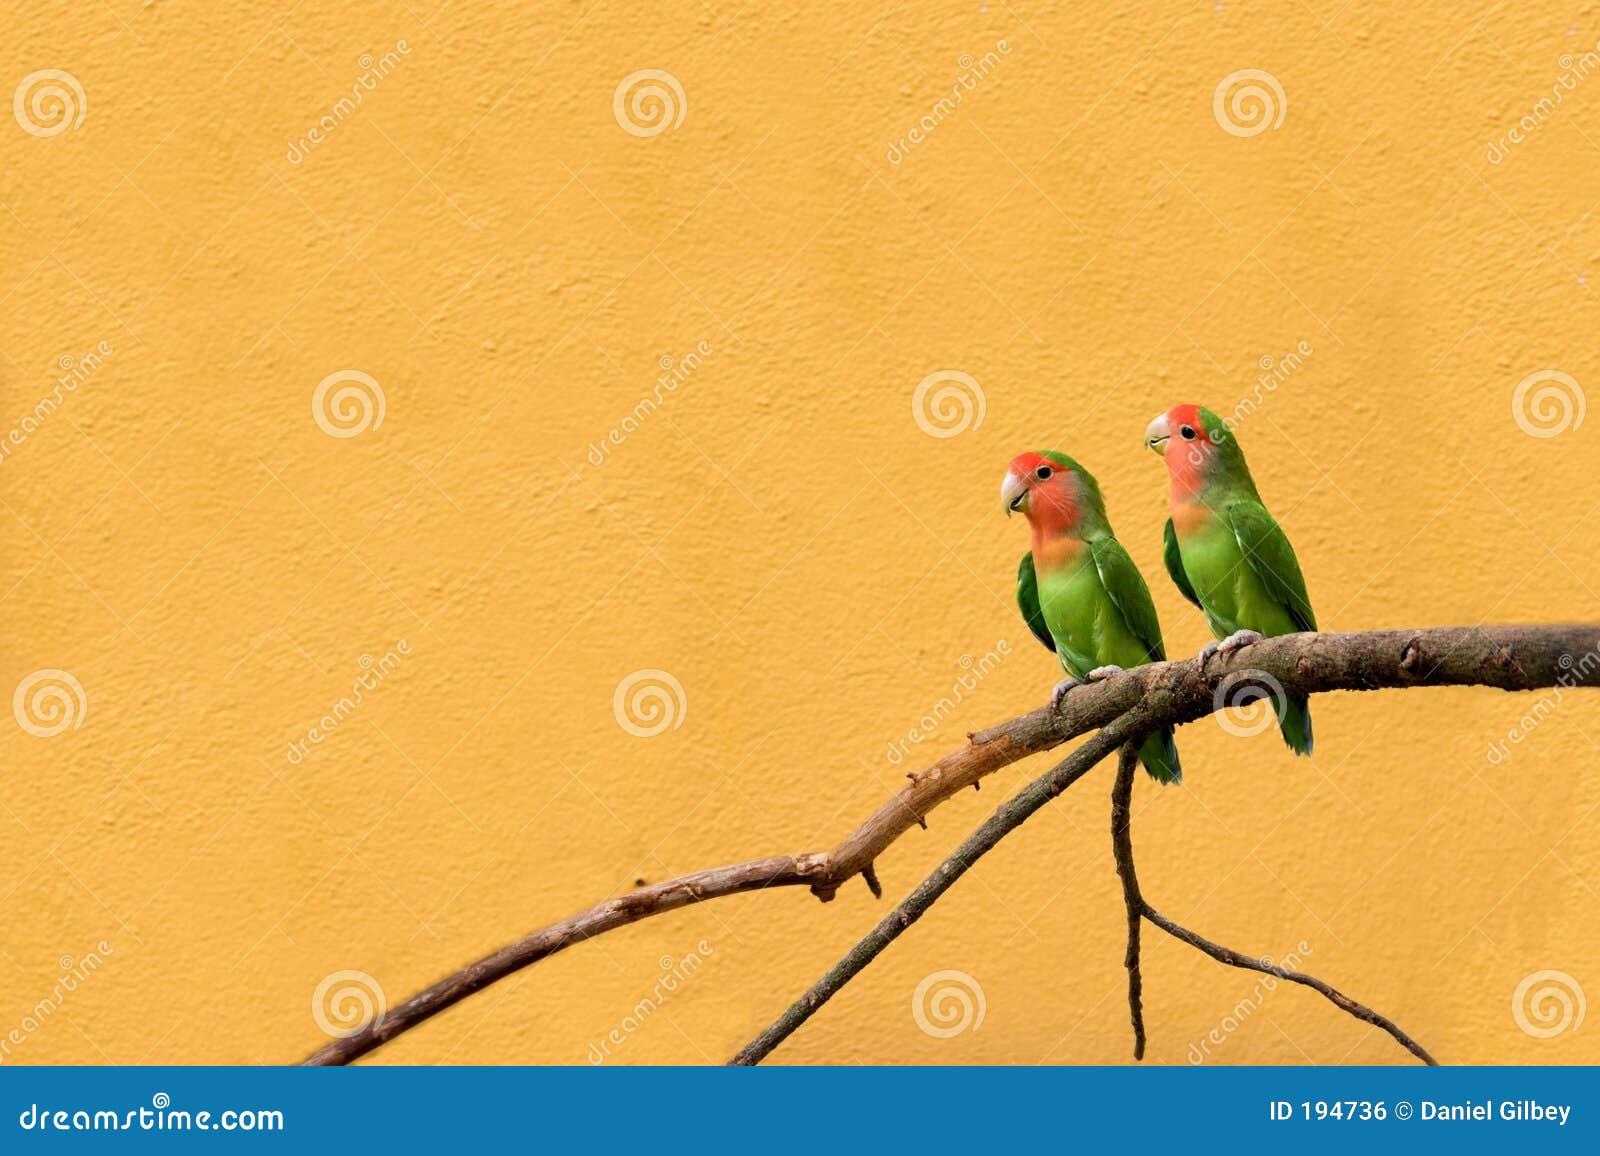 Peachfaced lovebird